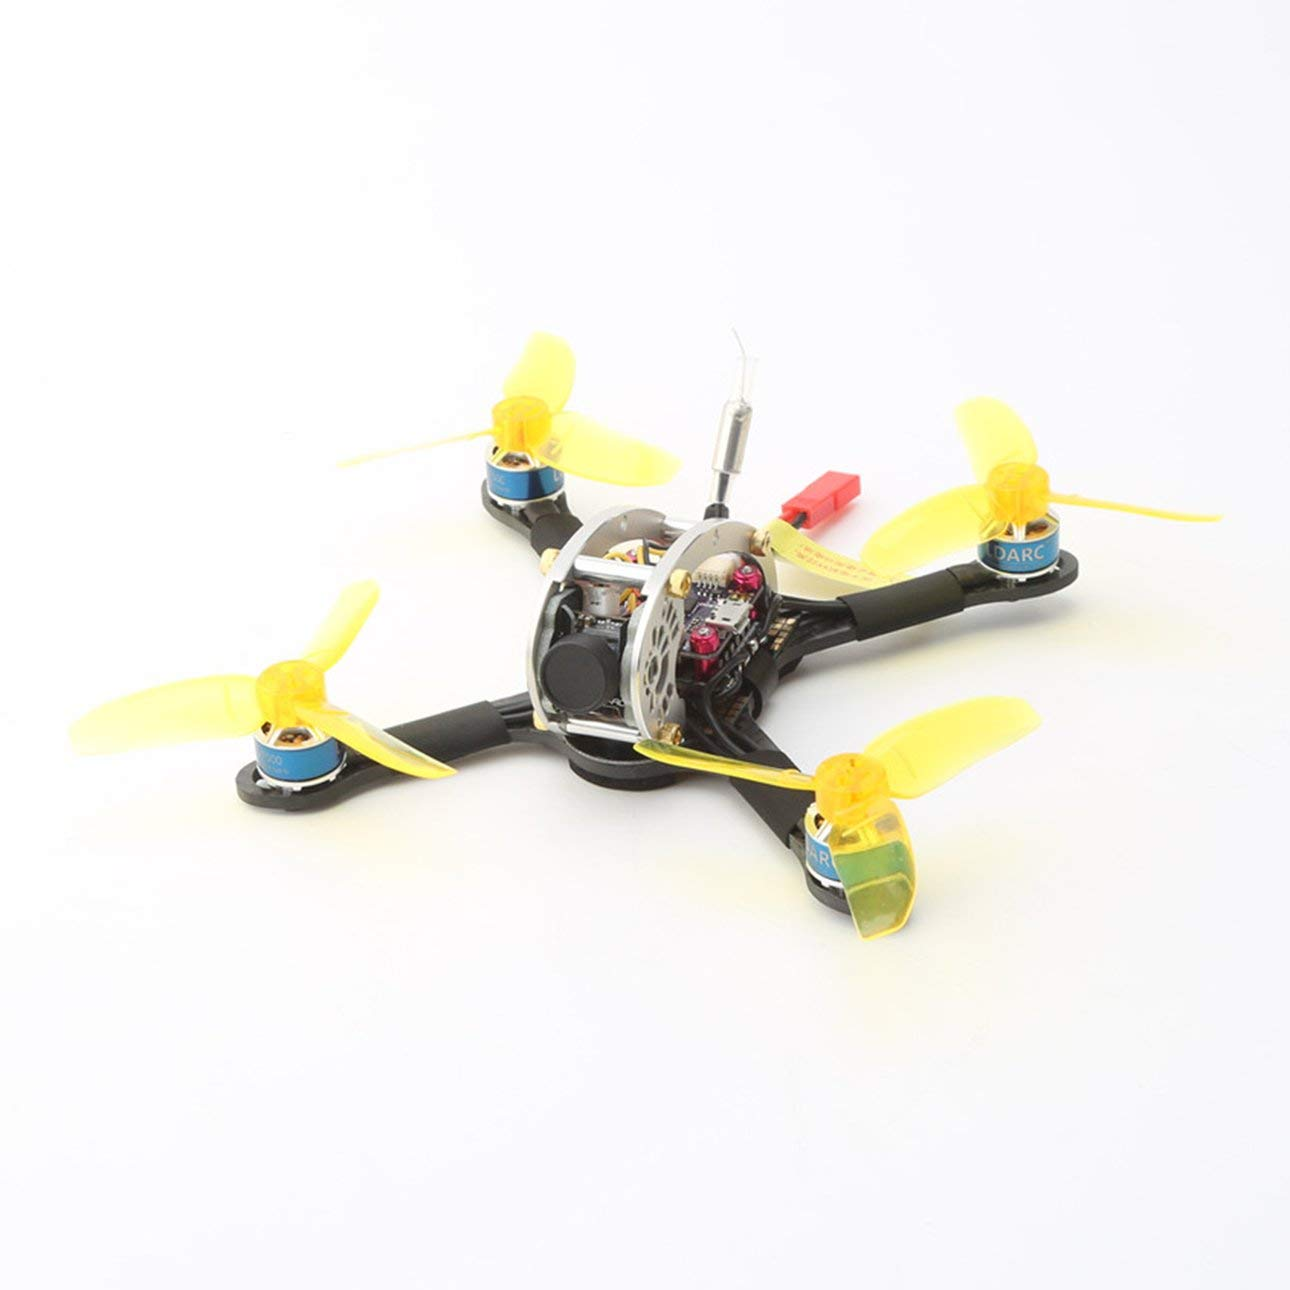 Ballylelly Drone con Fotocamera LDARC Flyegg 5.8G Telecamera OSD Senza spazzole AC900 RX Mini FPV RC Racing Drone PNP